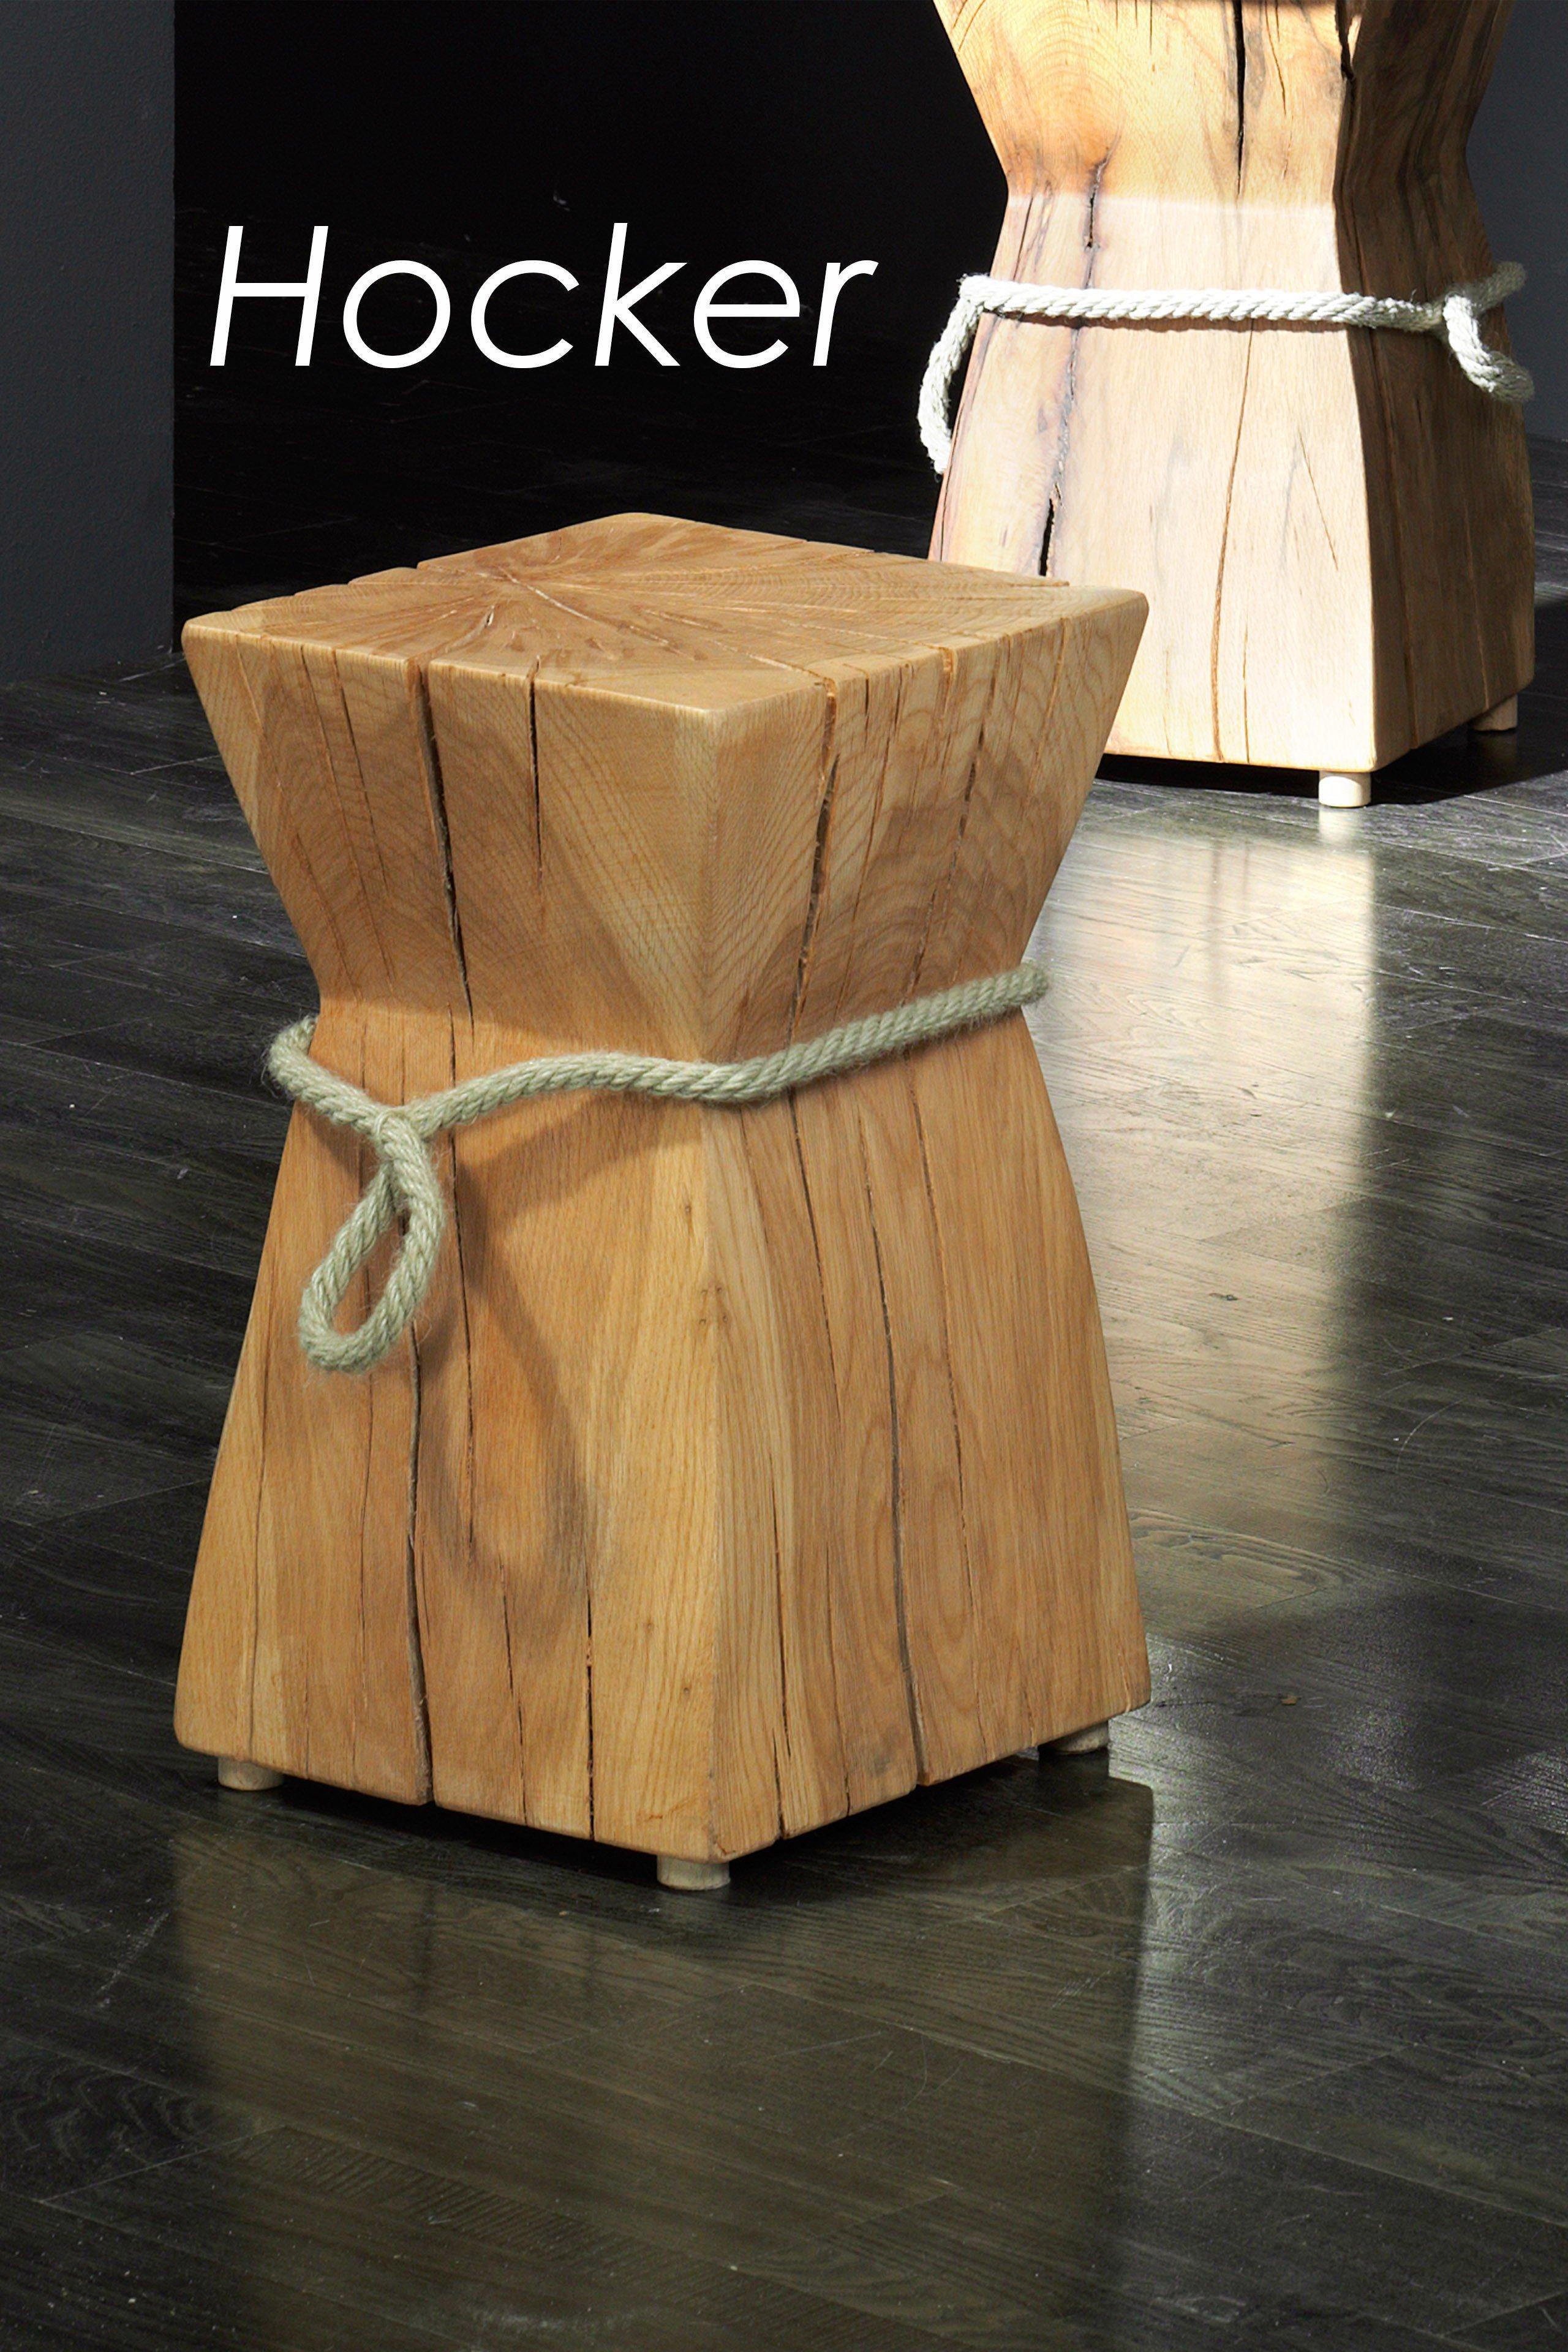 sprenger bett rosenheim kopfteil waldkante m bel letz ihr online shop. Black Bedroom Furniture Sets. Home Design Ideas